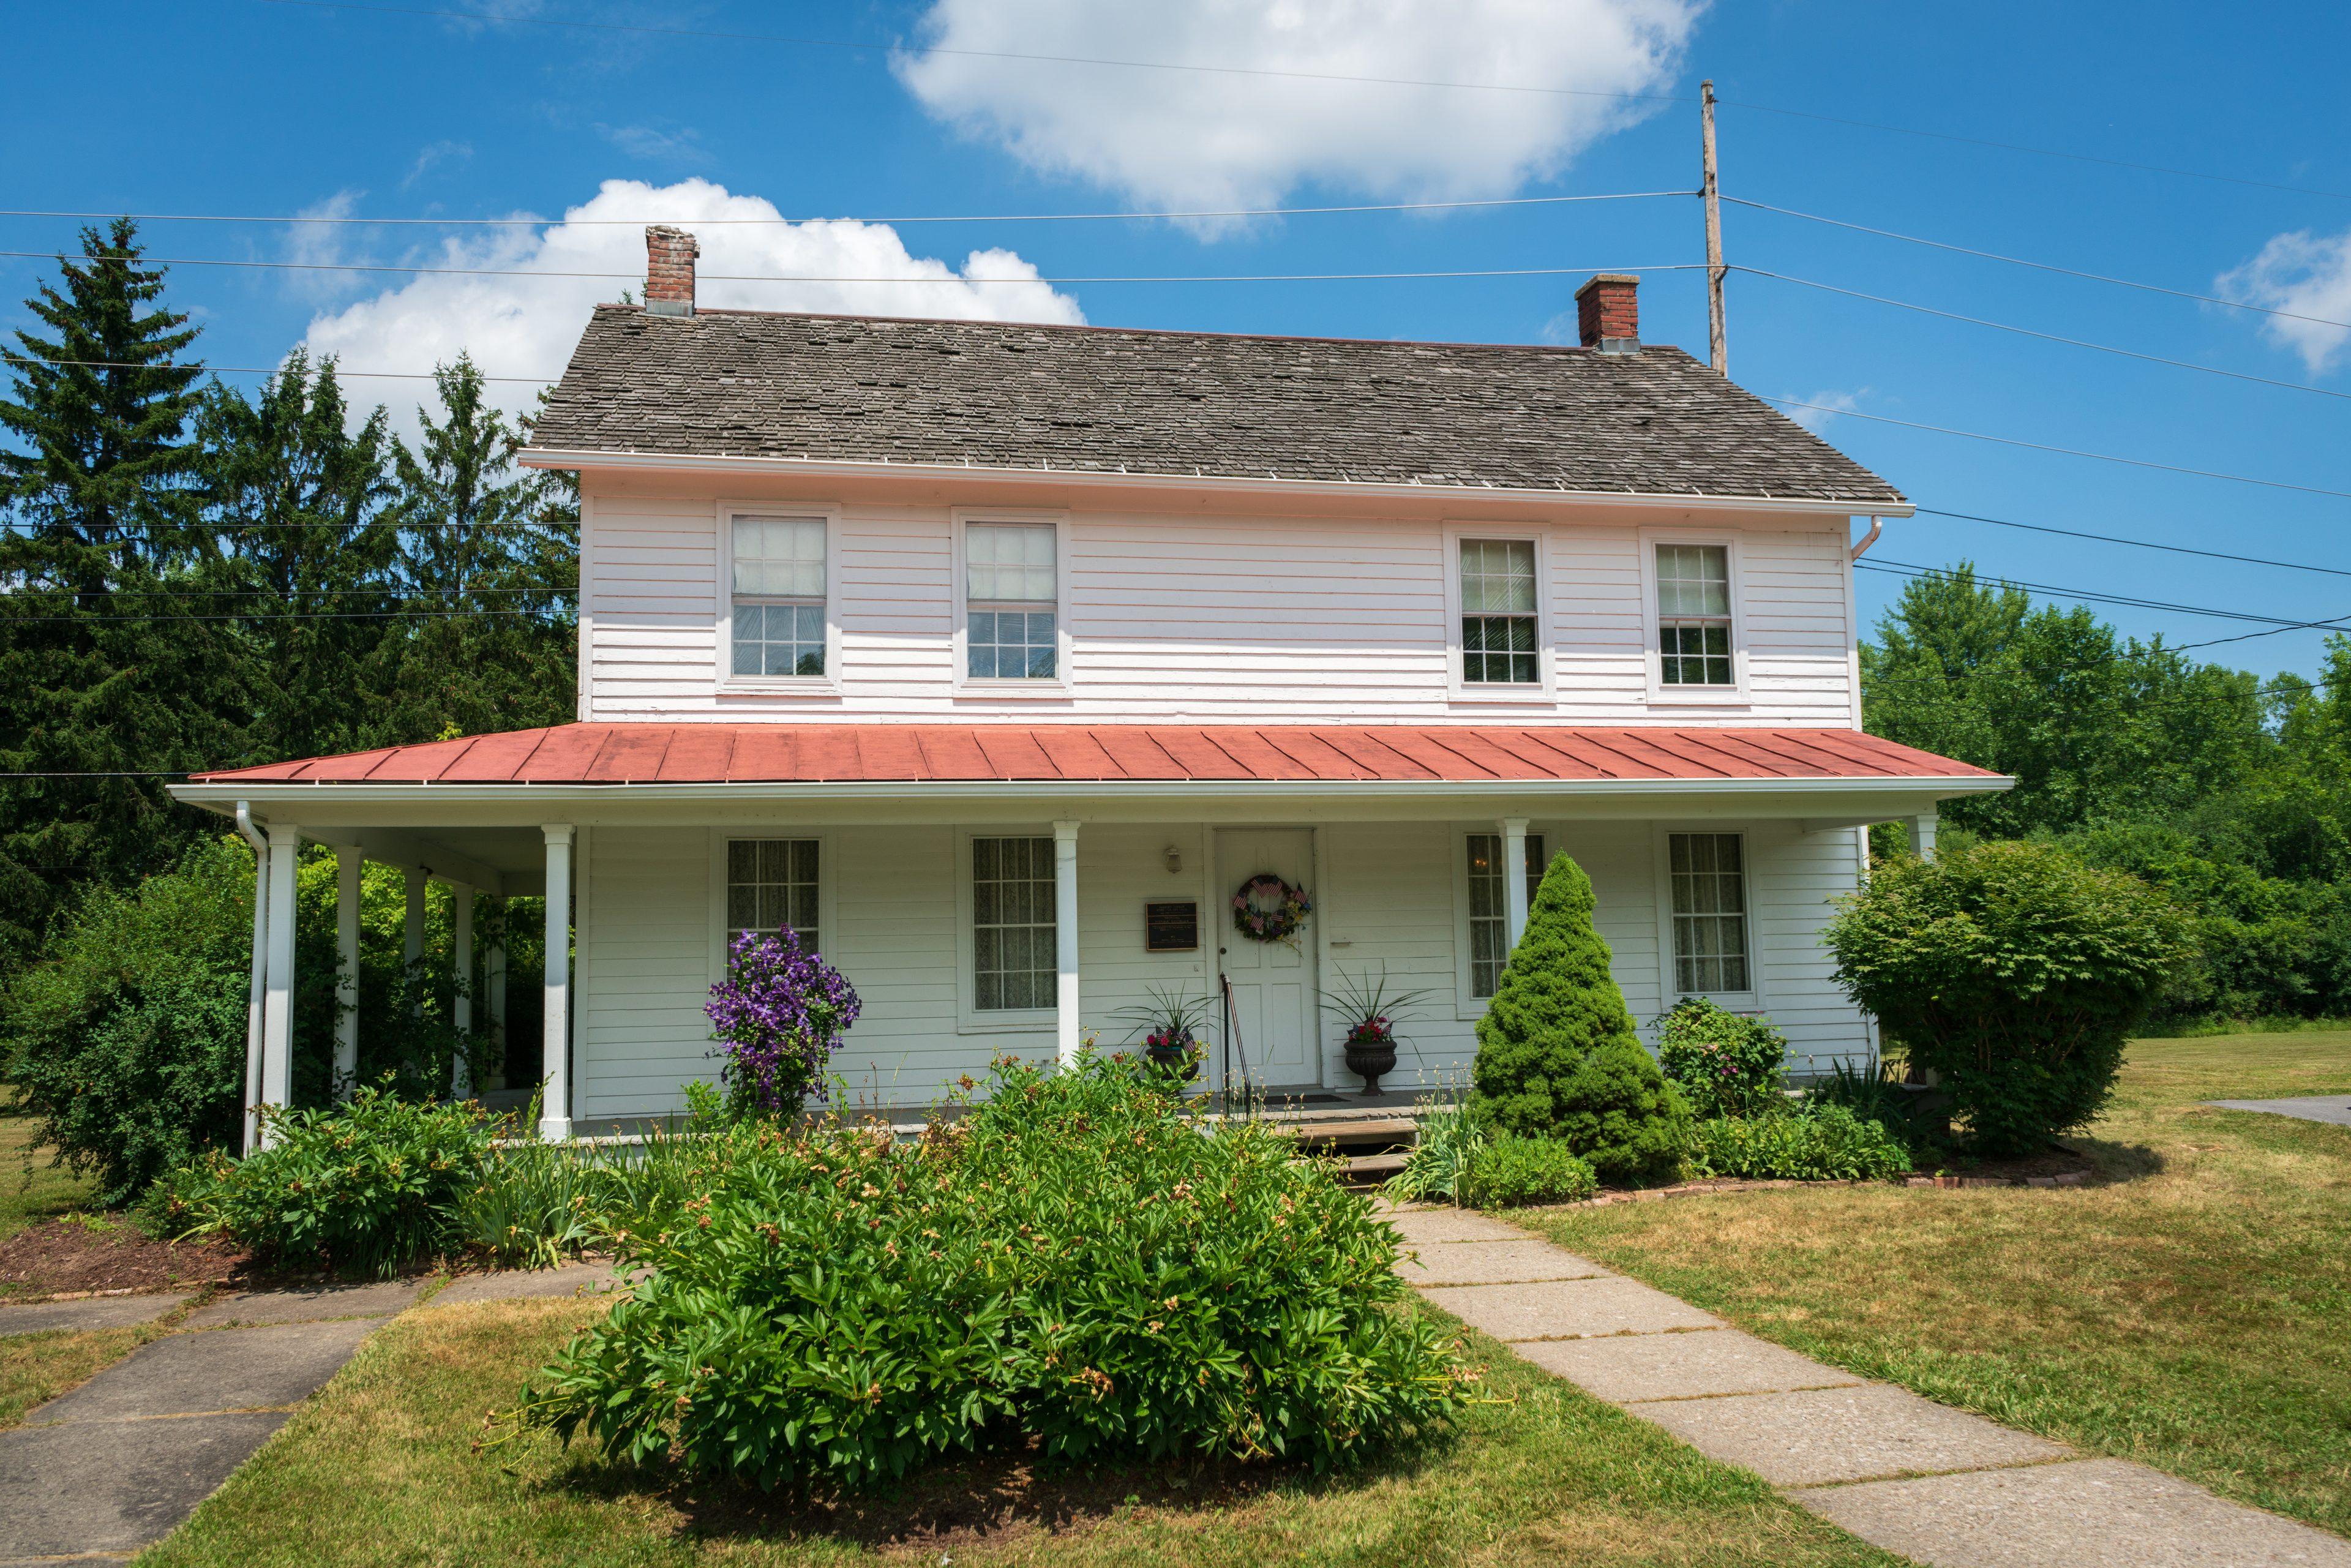 Harriet Tubman National Historic Park